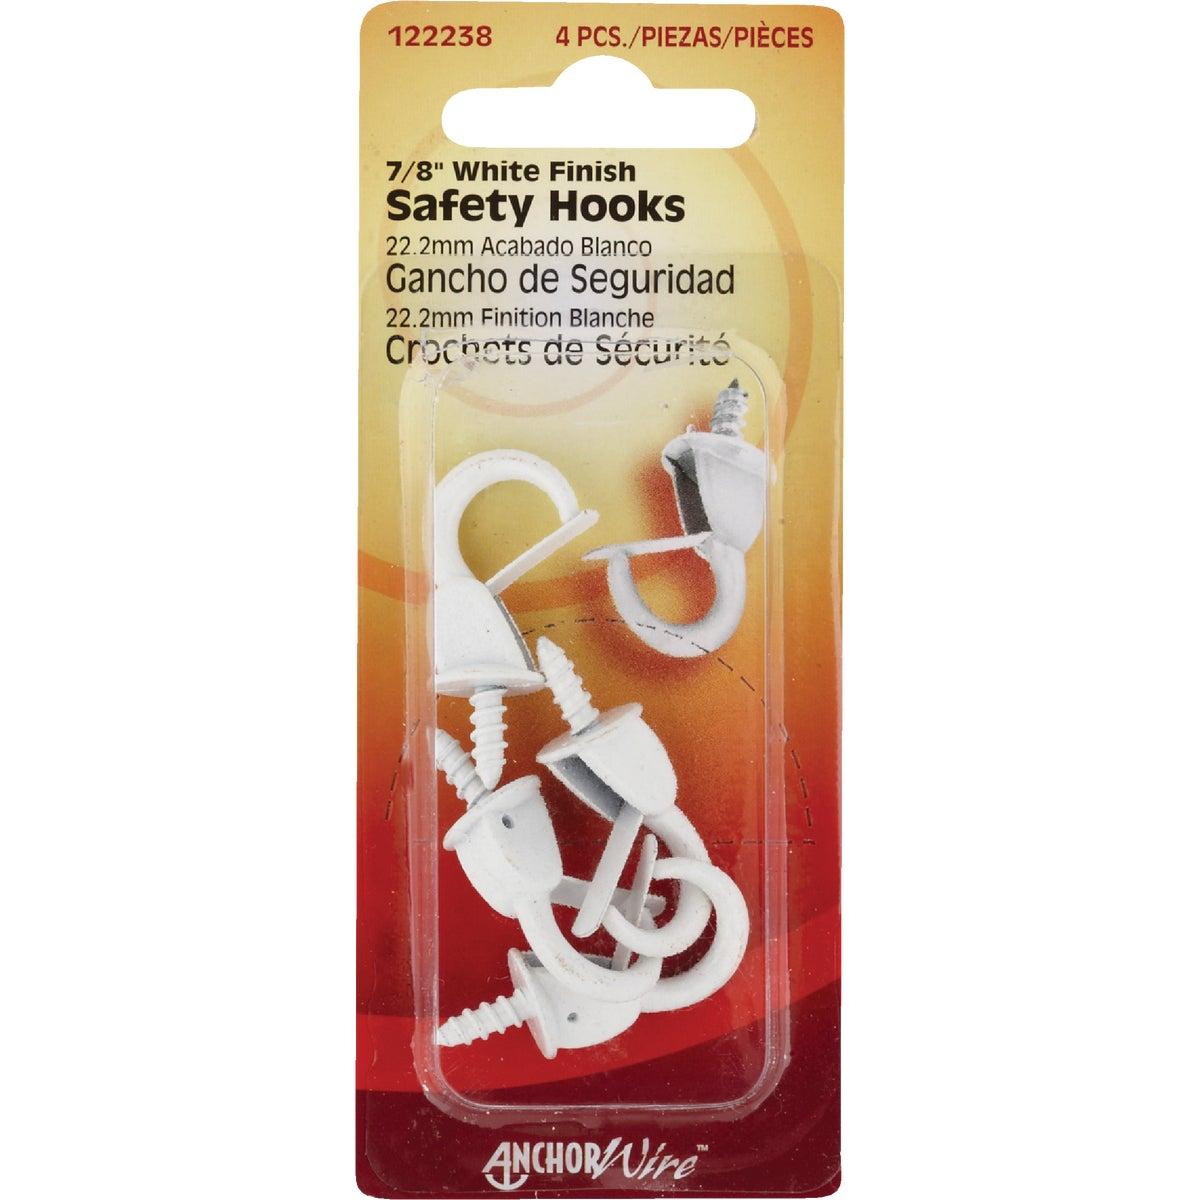 WHITE SAFETY HOOK